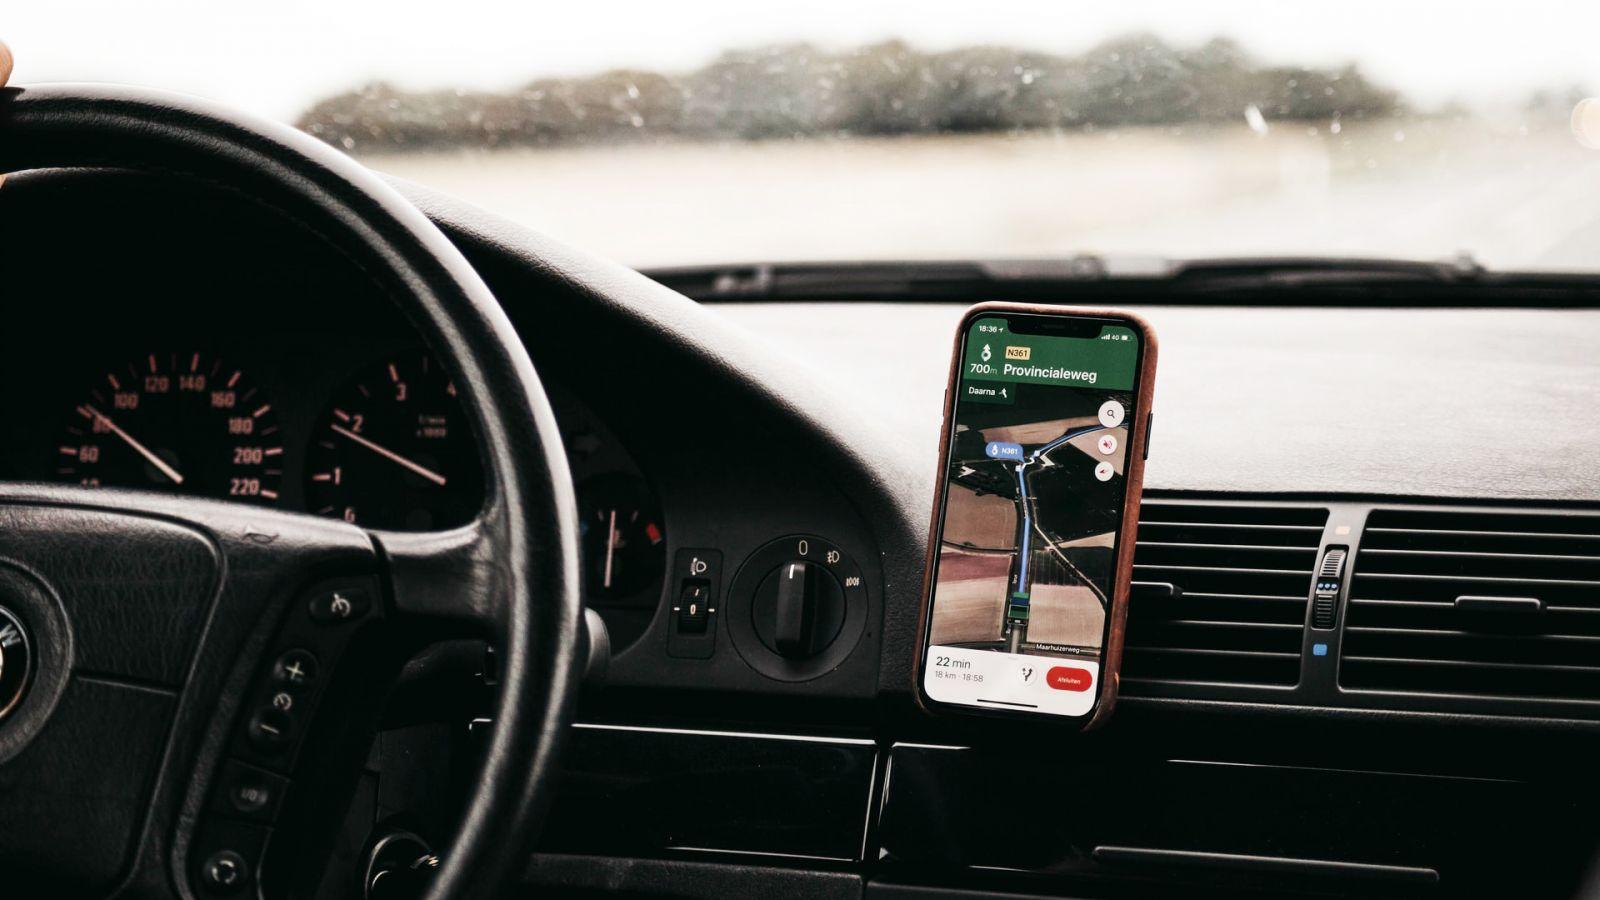 Google Maps: Η προσθήκη για να φτάνουμε πιο γρήγορα στον προορισμό μας